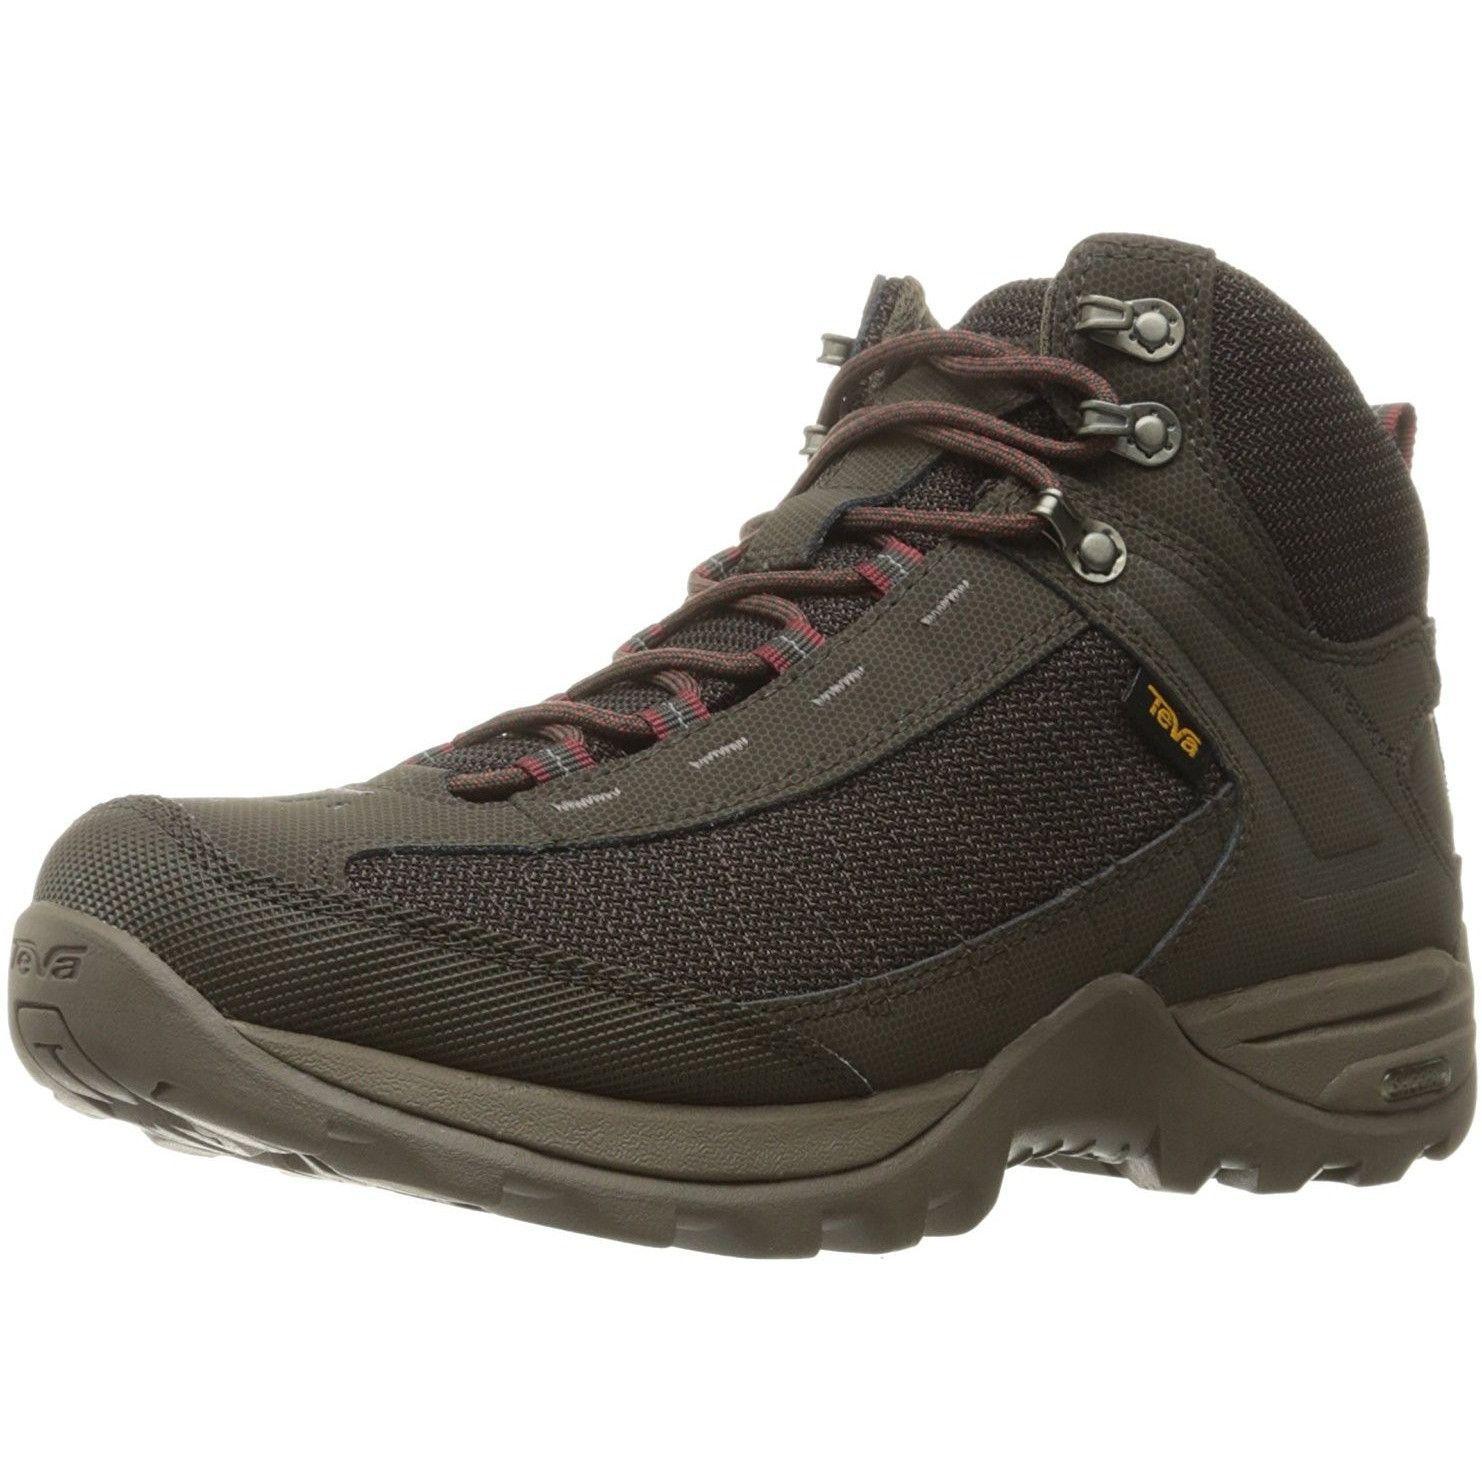 Teva Raith III Mid Waterproof Hiking Boot (Men)